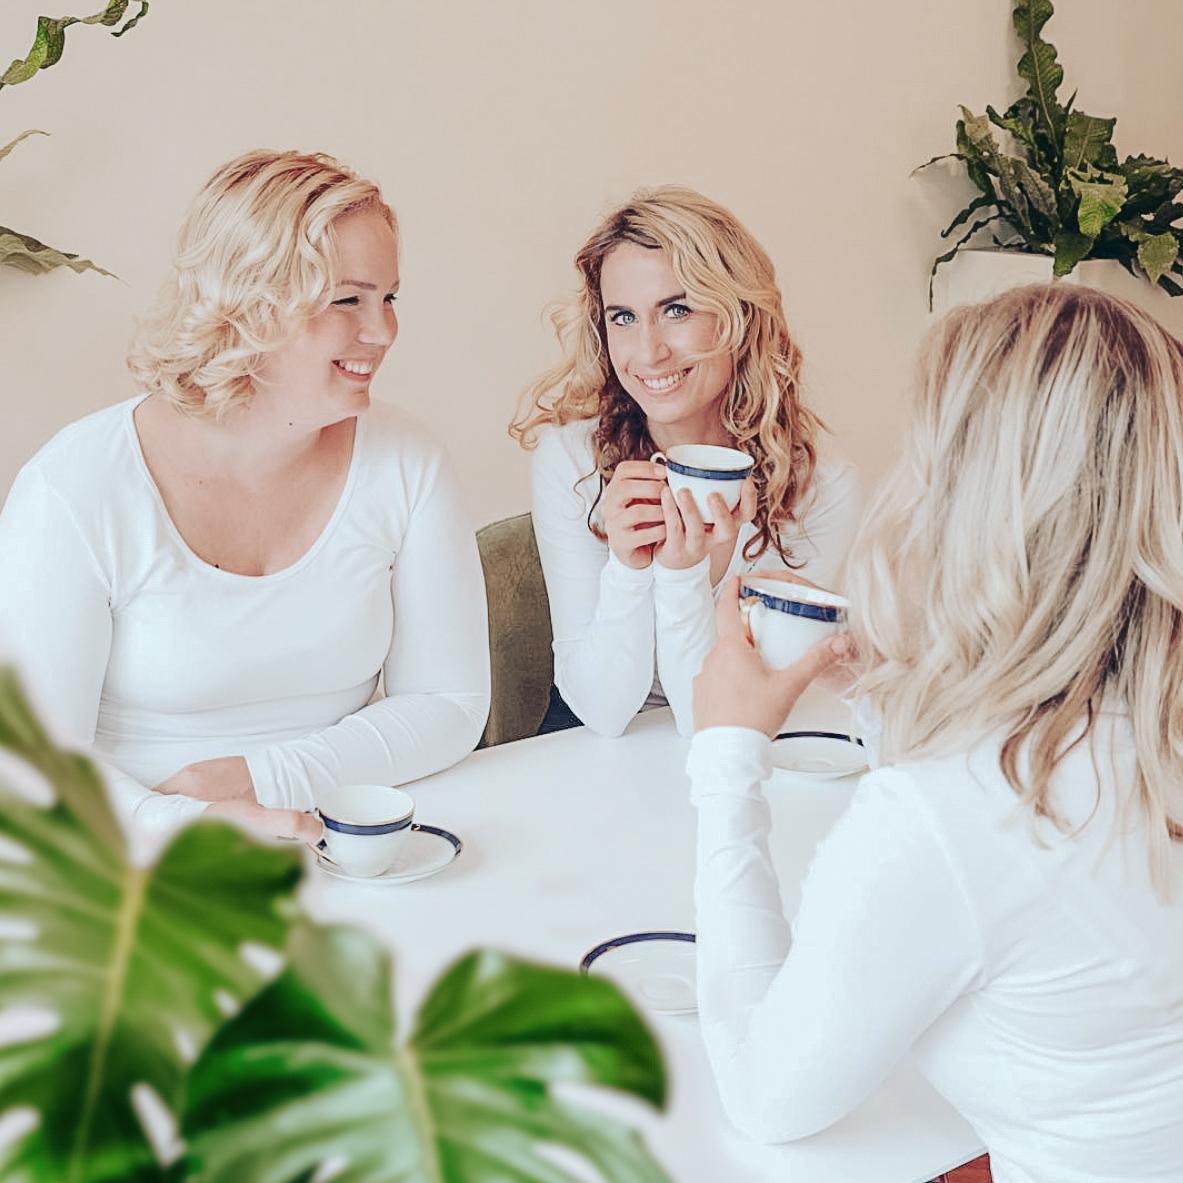 Koffiebar-fotoshoot-personal-branding-fotografie